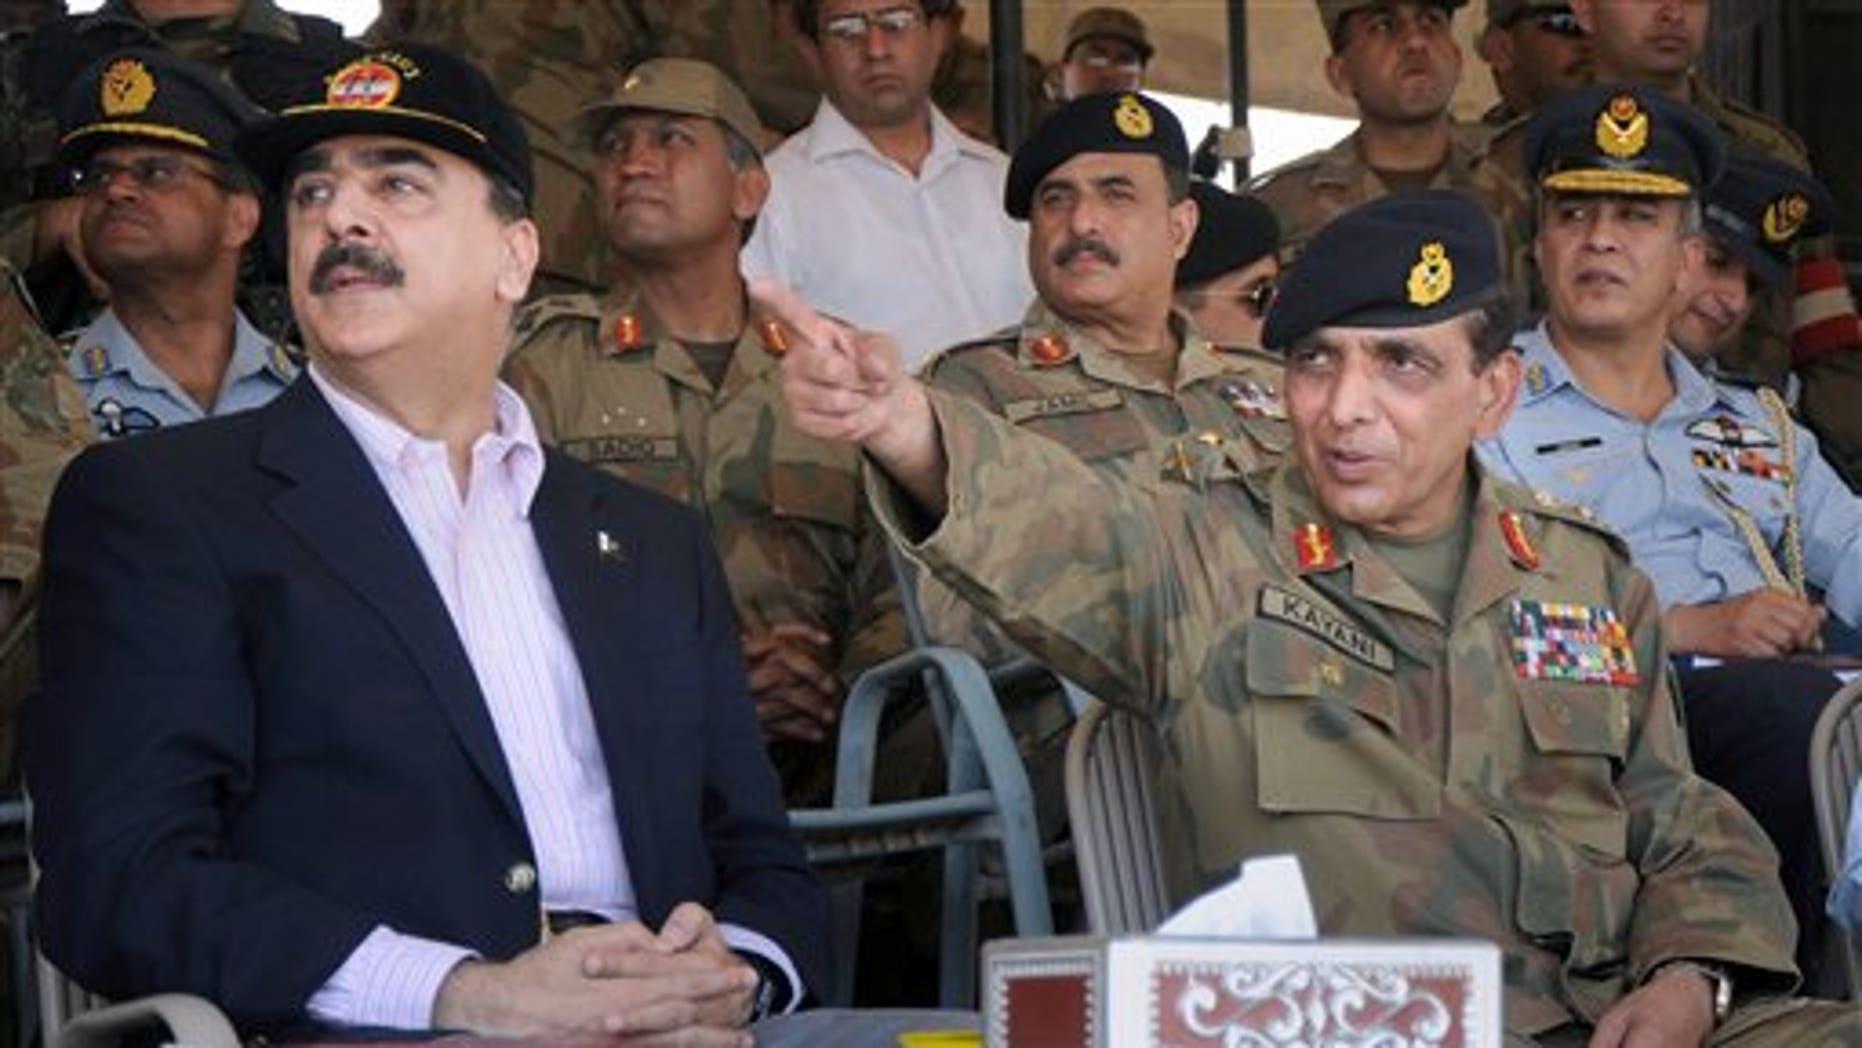 April 10, 2010: Pakistan's Army Chief Gen. Ashfaq Pervez Kayani, right, and Pakistan's Prime Minister Yousuf Raza Gilani, left, watch a military exercise in the Cholistan Desert near Bahawalpur, Pakistan.